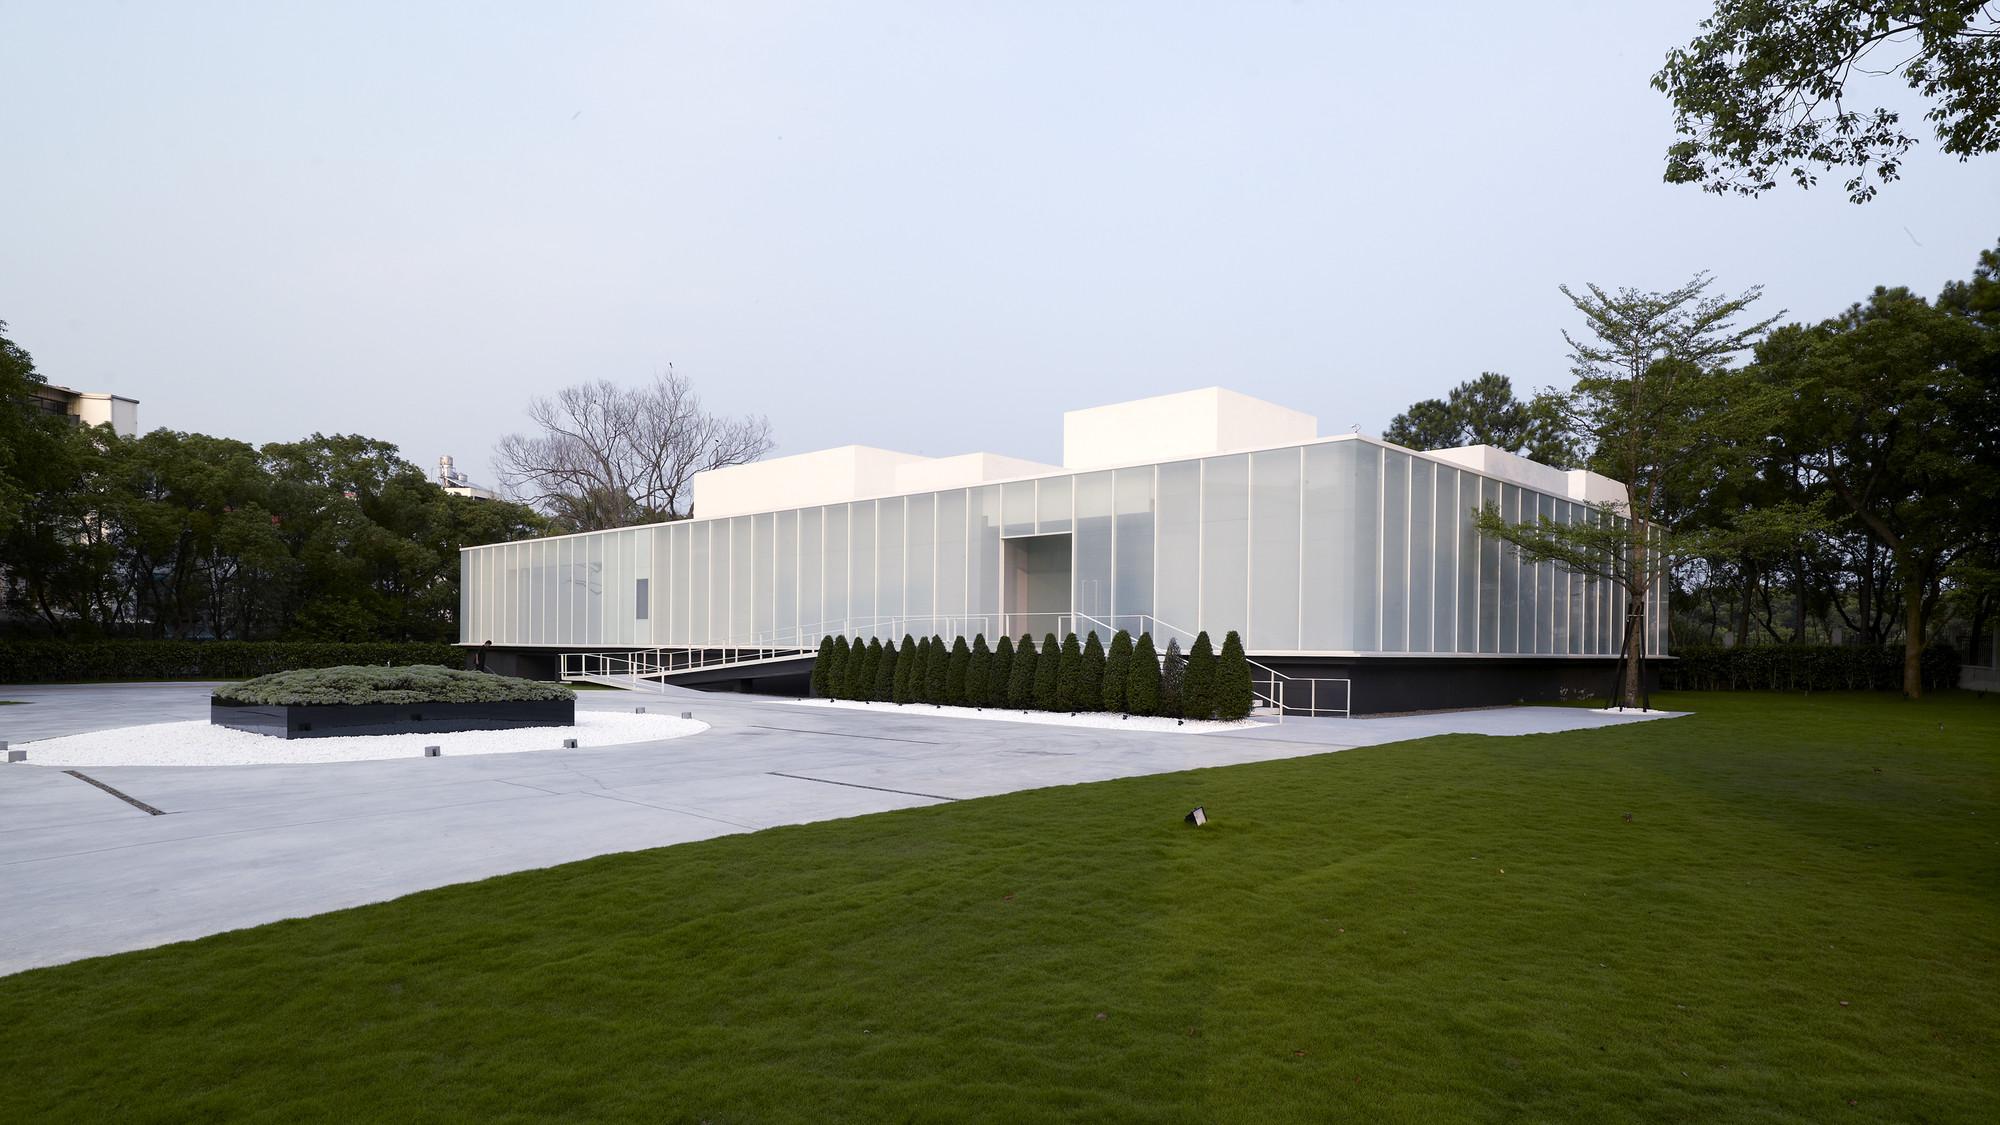 Gallery of lightbox hsuyuan kuo architect associates 16 for Architect associates